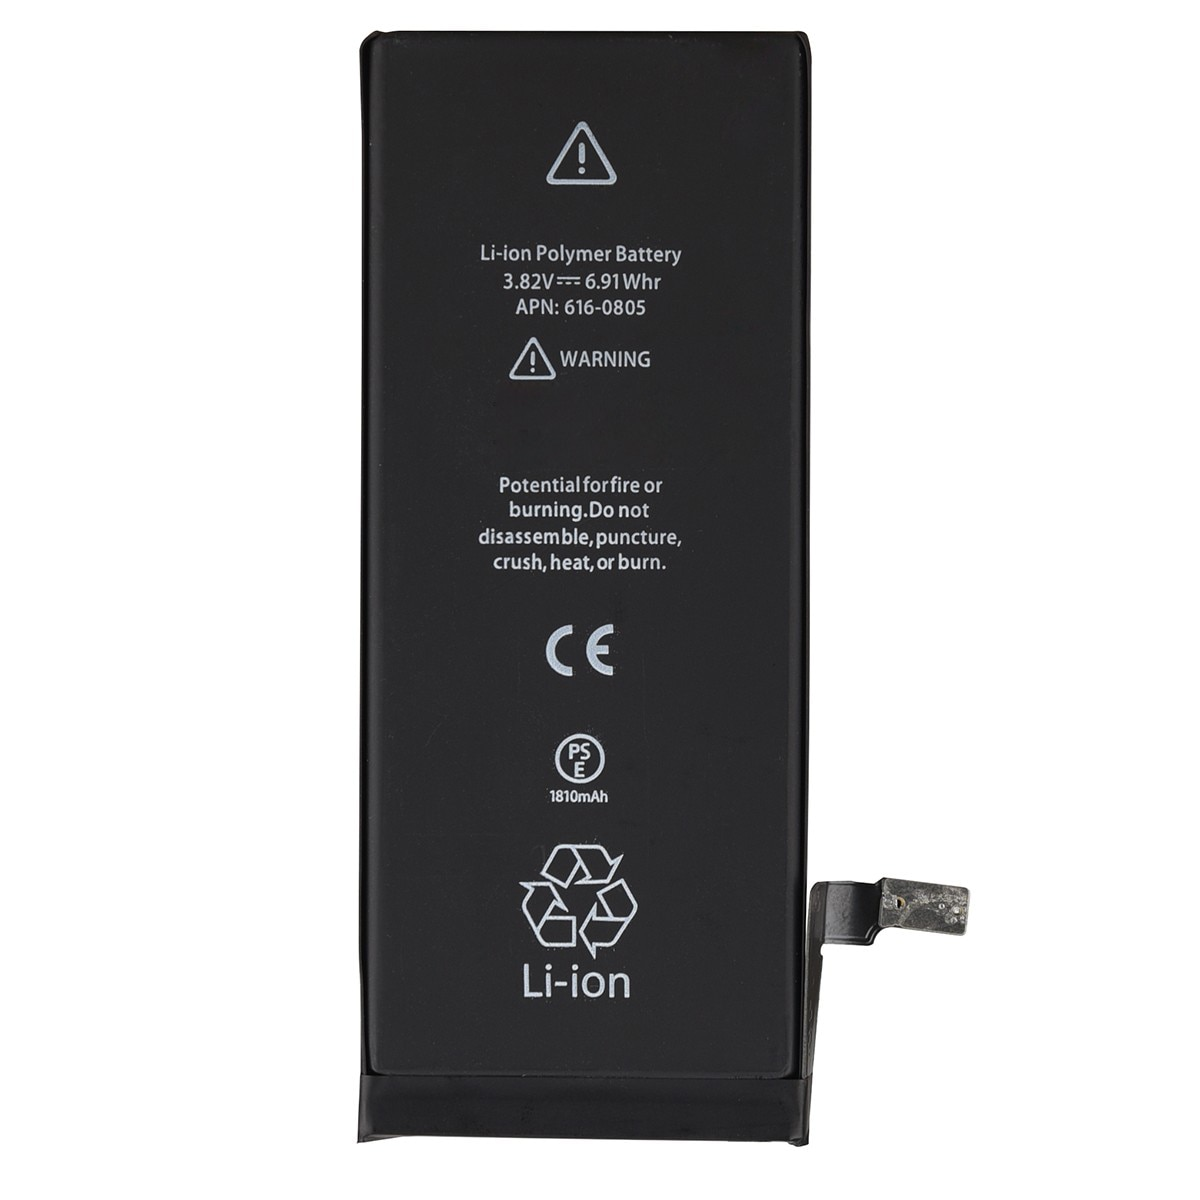 Batería de repuesto GOLDFOX de 1810mAh para iPhone 6, batería recargable de Li-ion para teléfono móvil